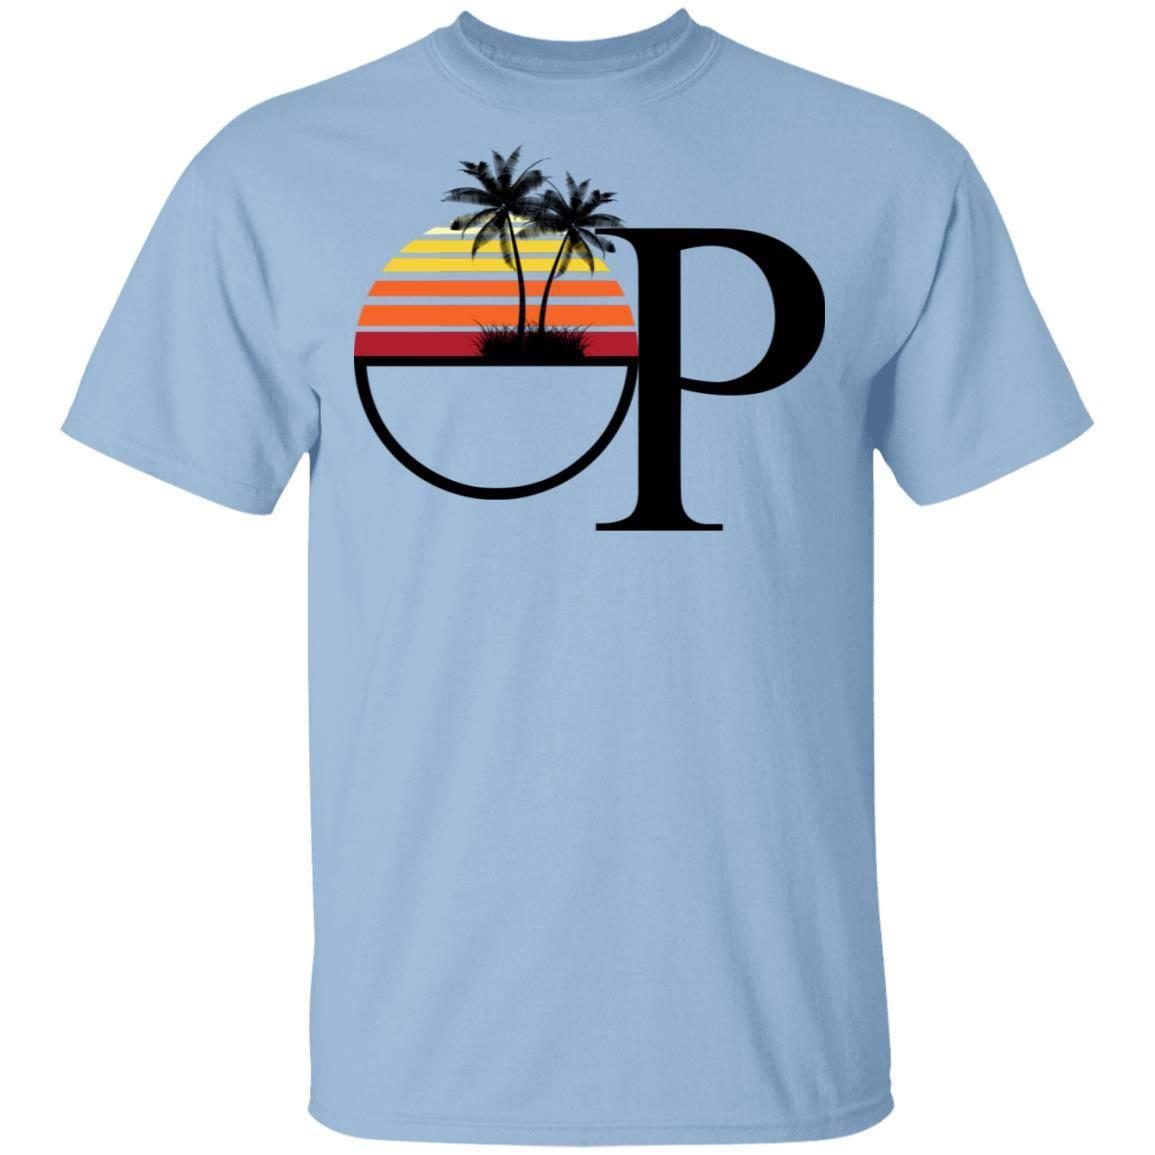 Ocean Pacific Vintage 80S Surfwear – T-Shirt for Men, Women